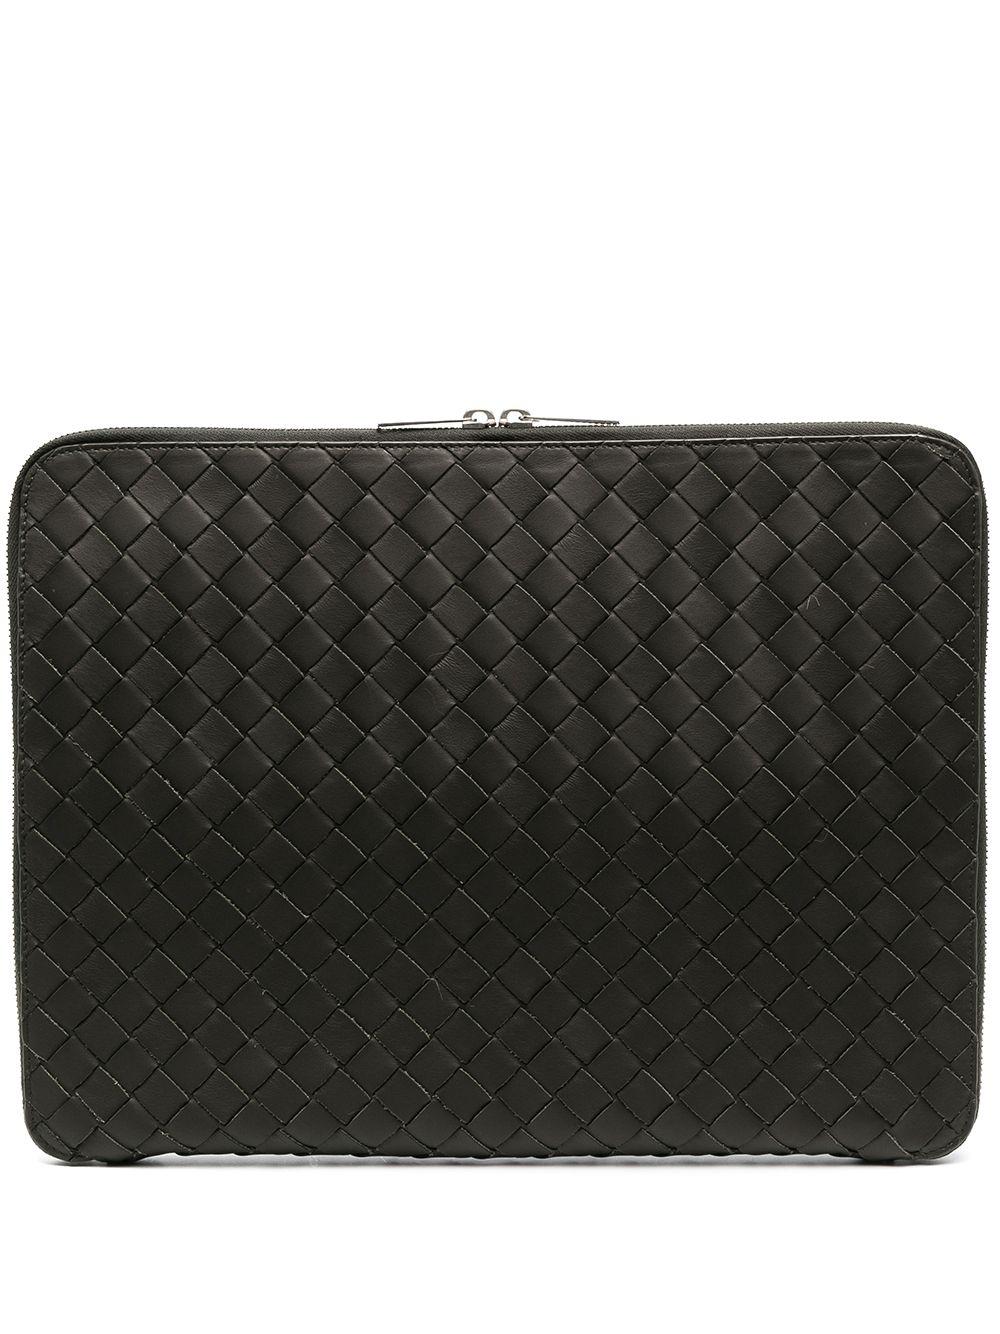 Bottega Veneta Intrecciato laptop clutch bag - Grün